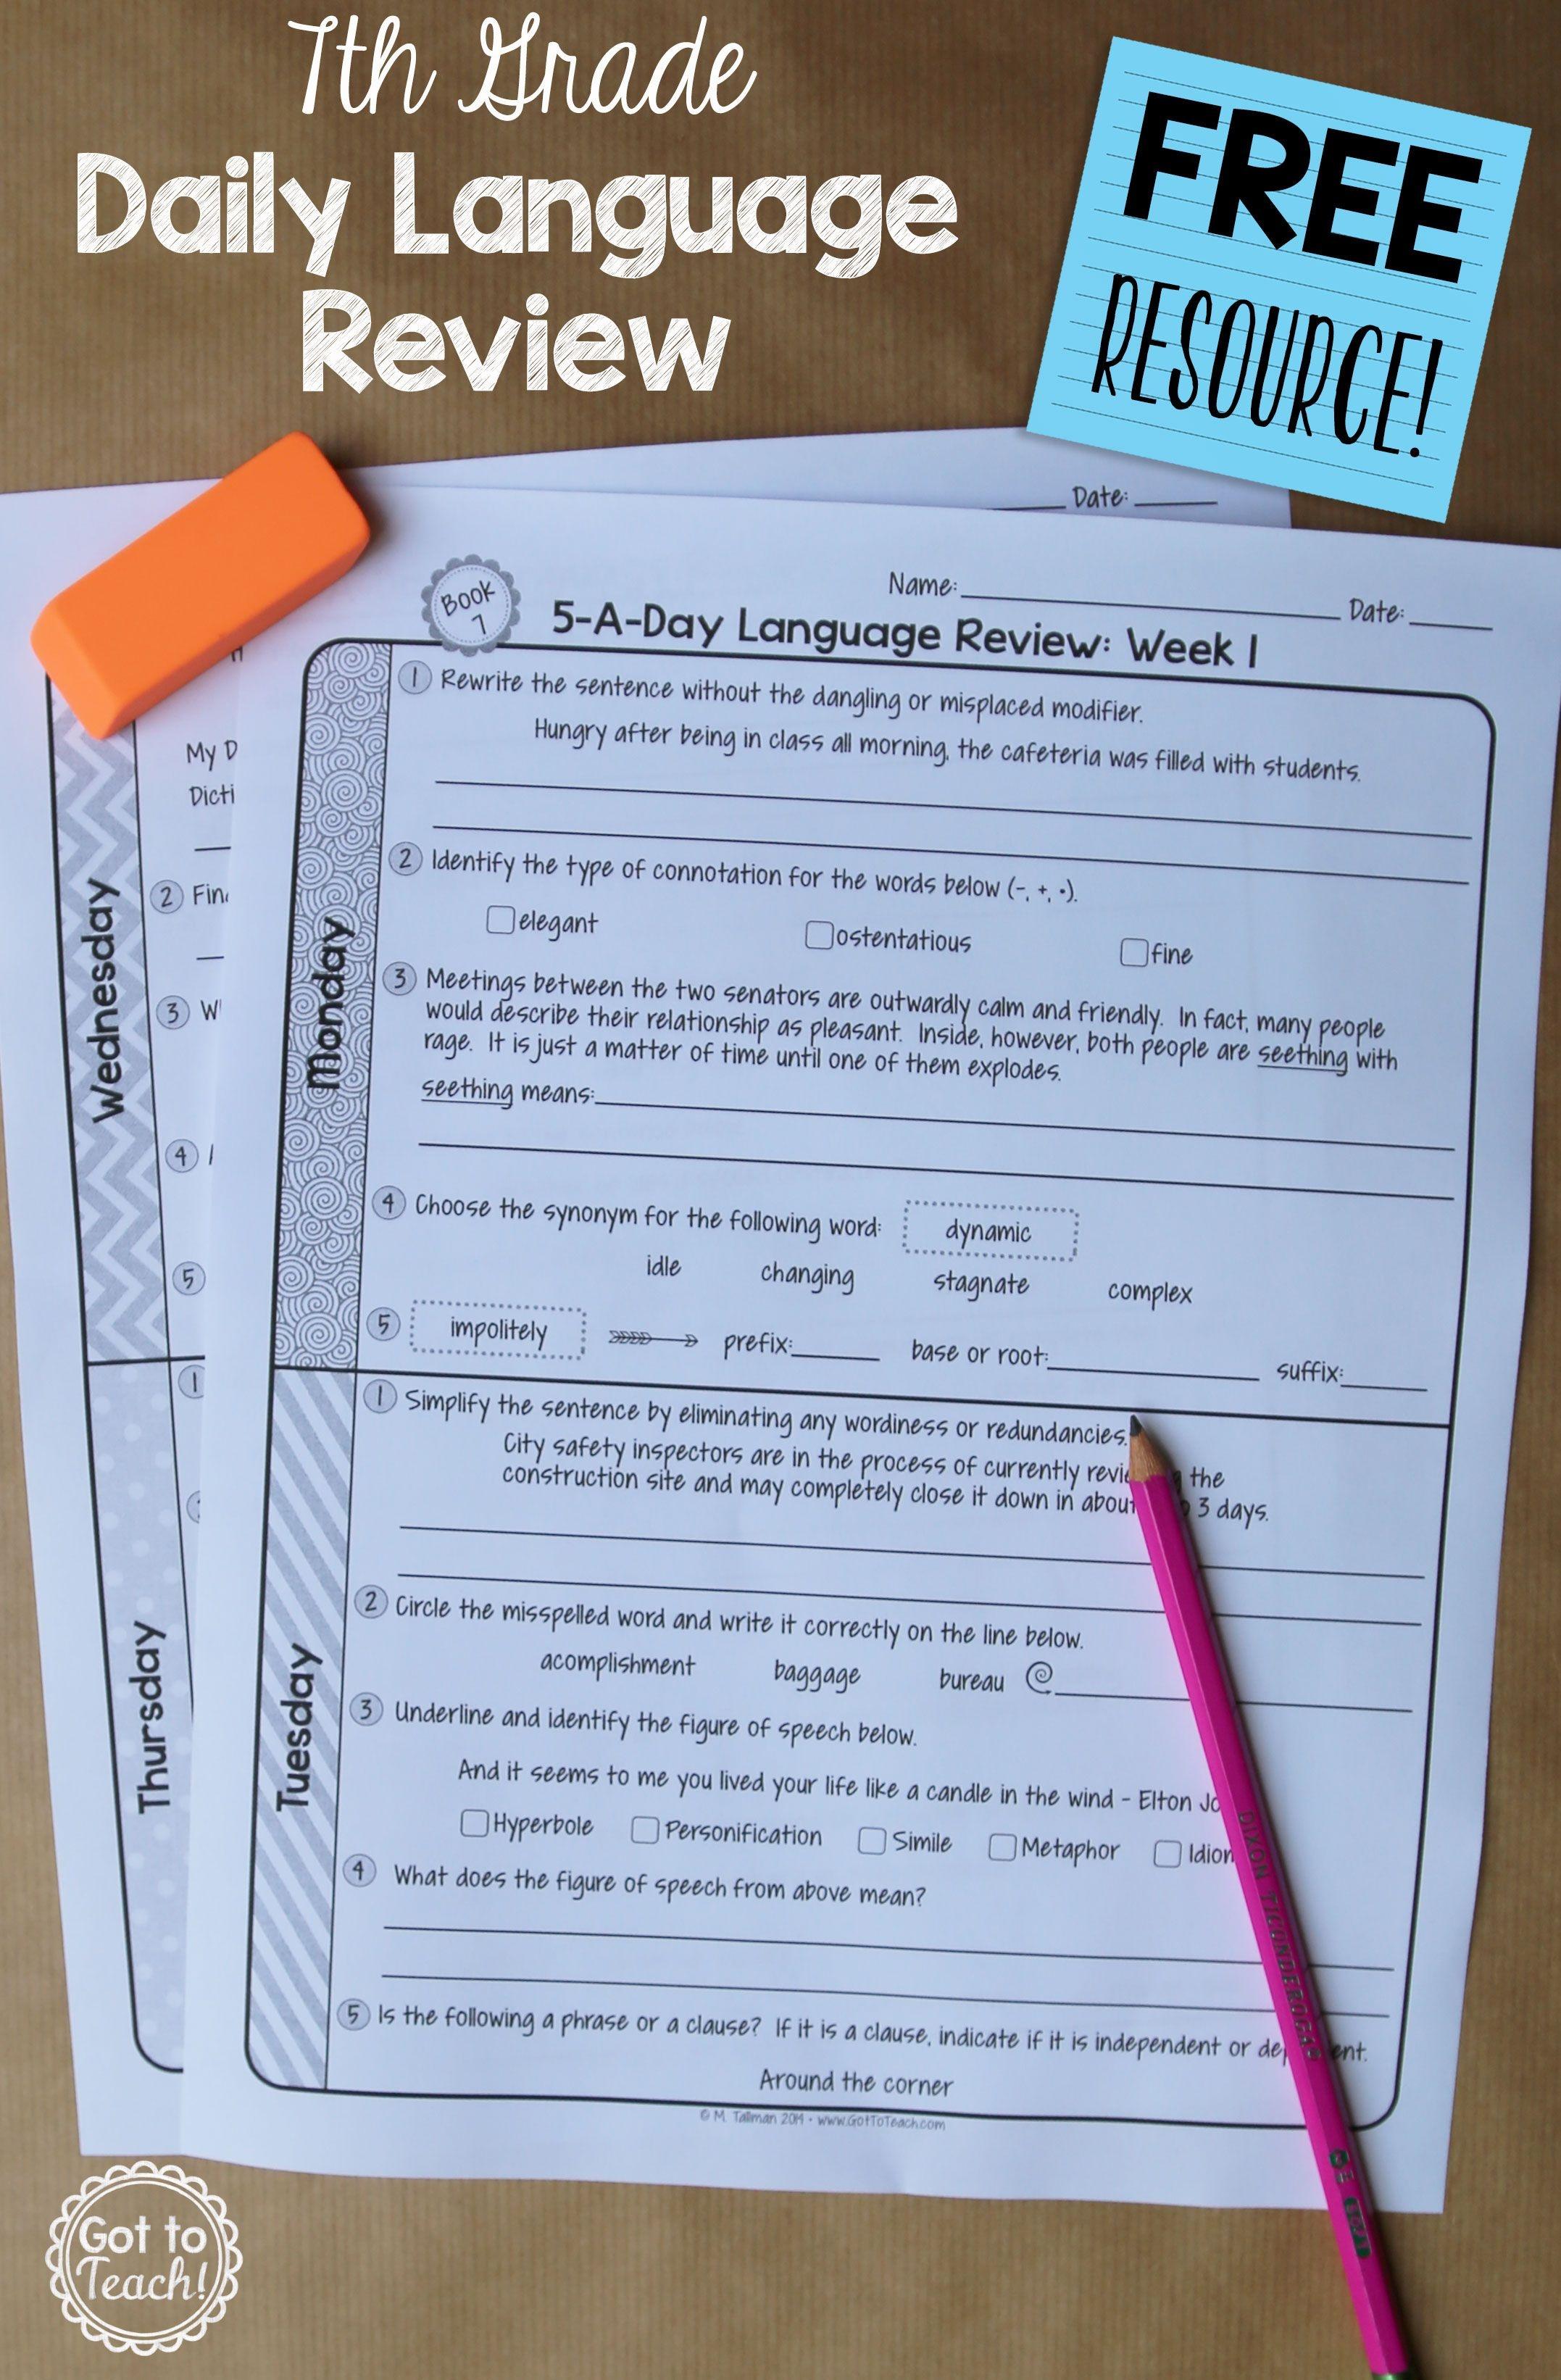 7Th Grade Daily Language Review - 1 Week Free | Middleschoolmaestros - Daily Language Review Grade 5 Free Printable